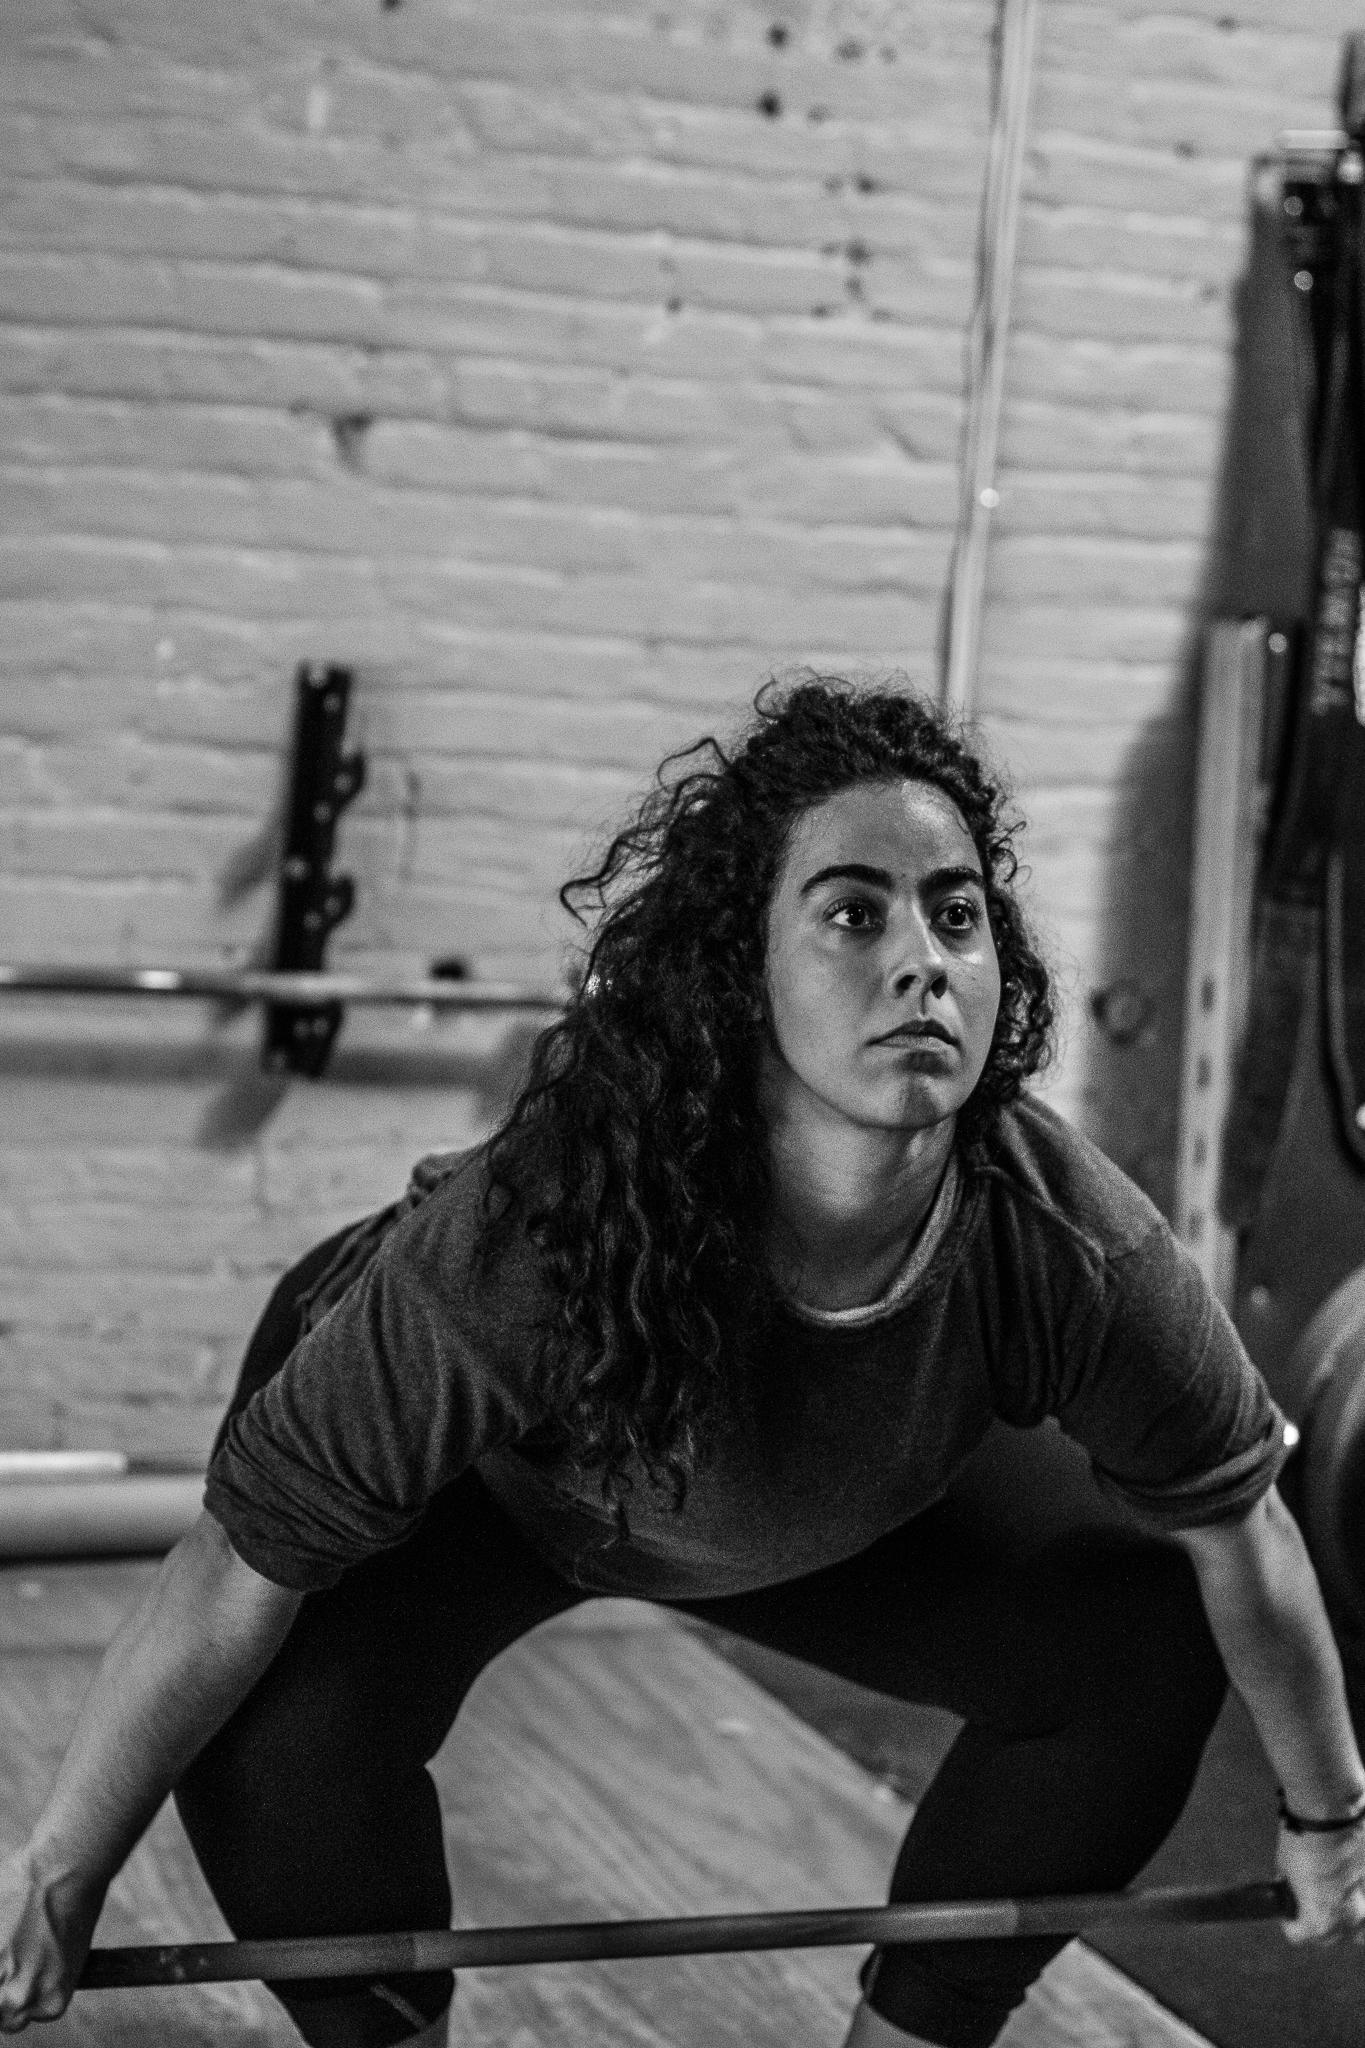 james-wright-visit-brooklyn-new-york-weightlifting-coach-teammates-october-2016 (19 of 92).jpg